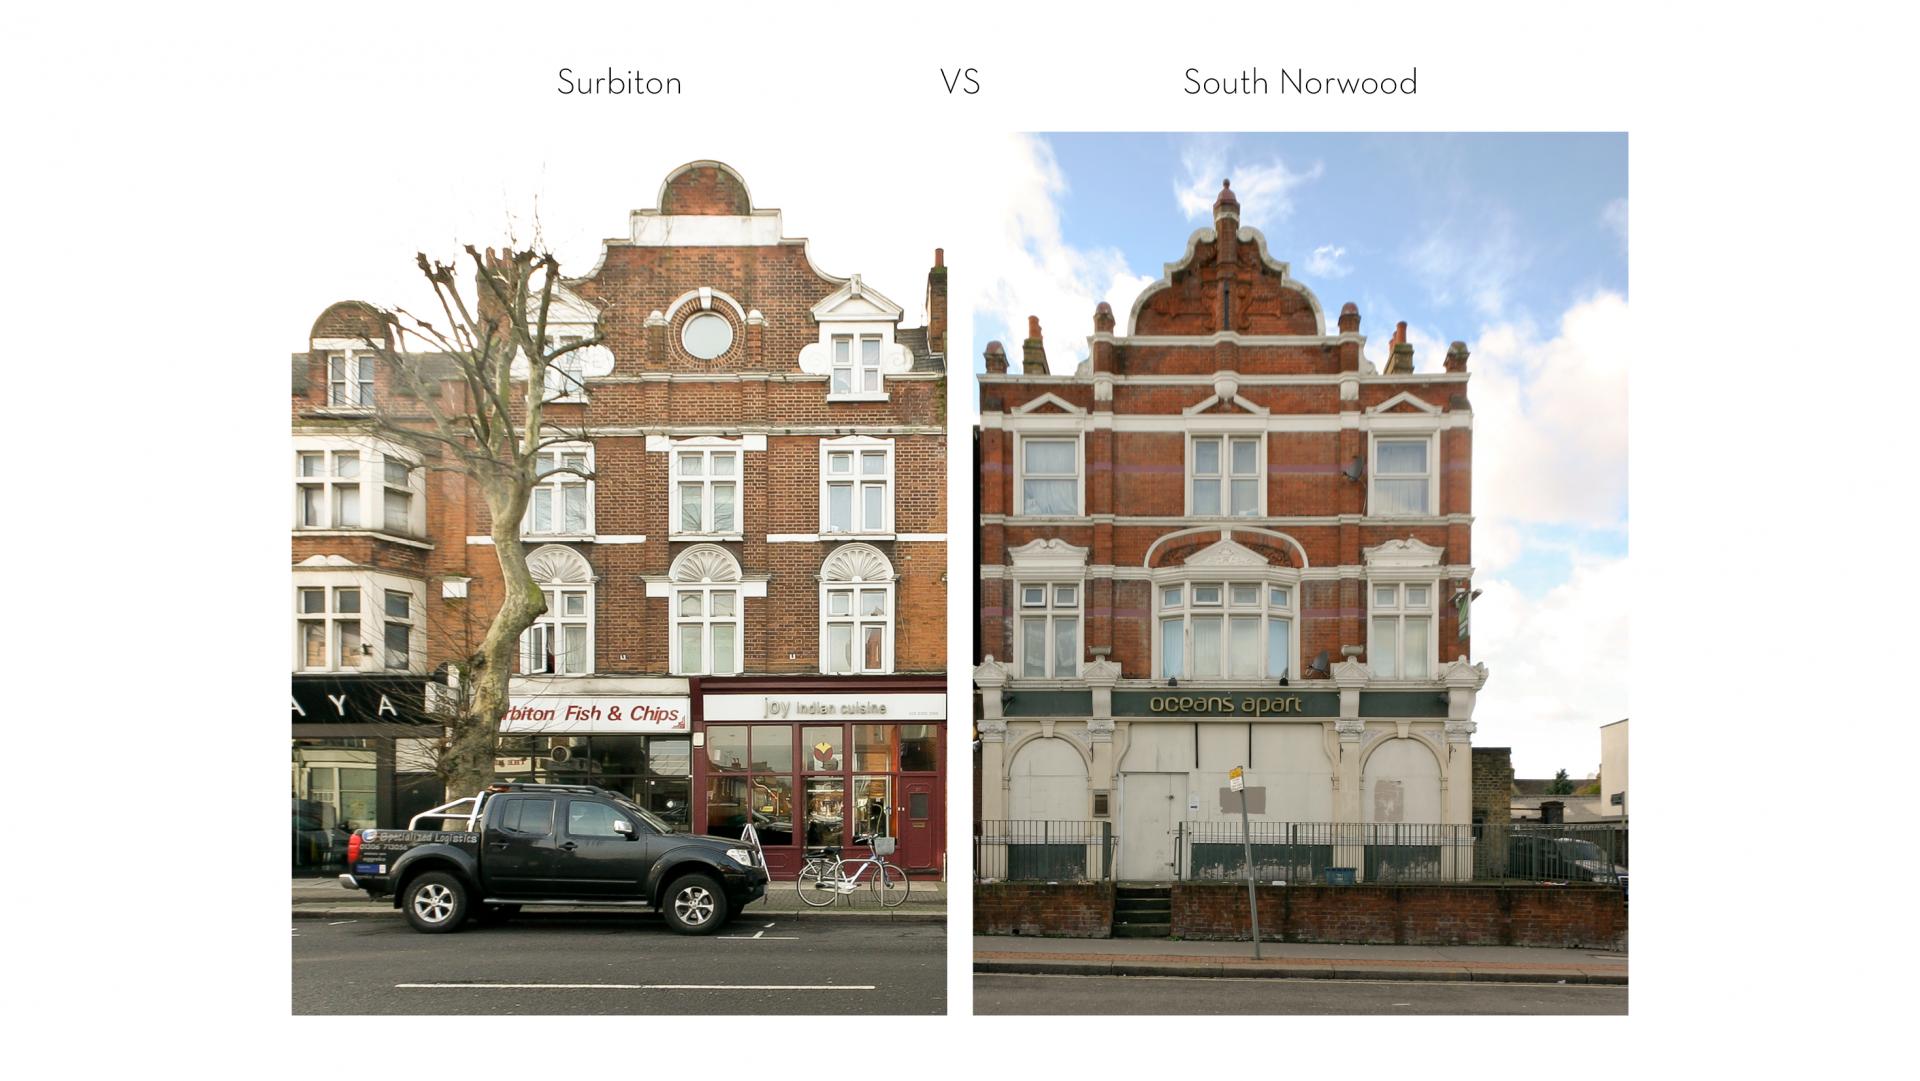 Urban morphology & building adaptation - area comparison